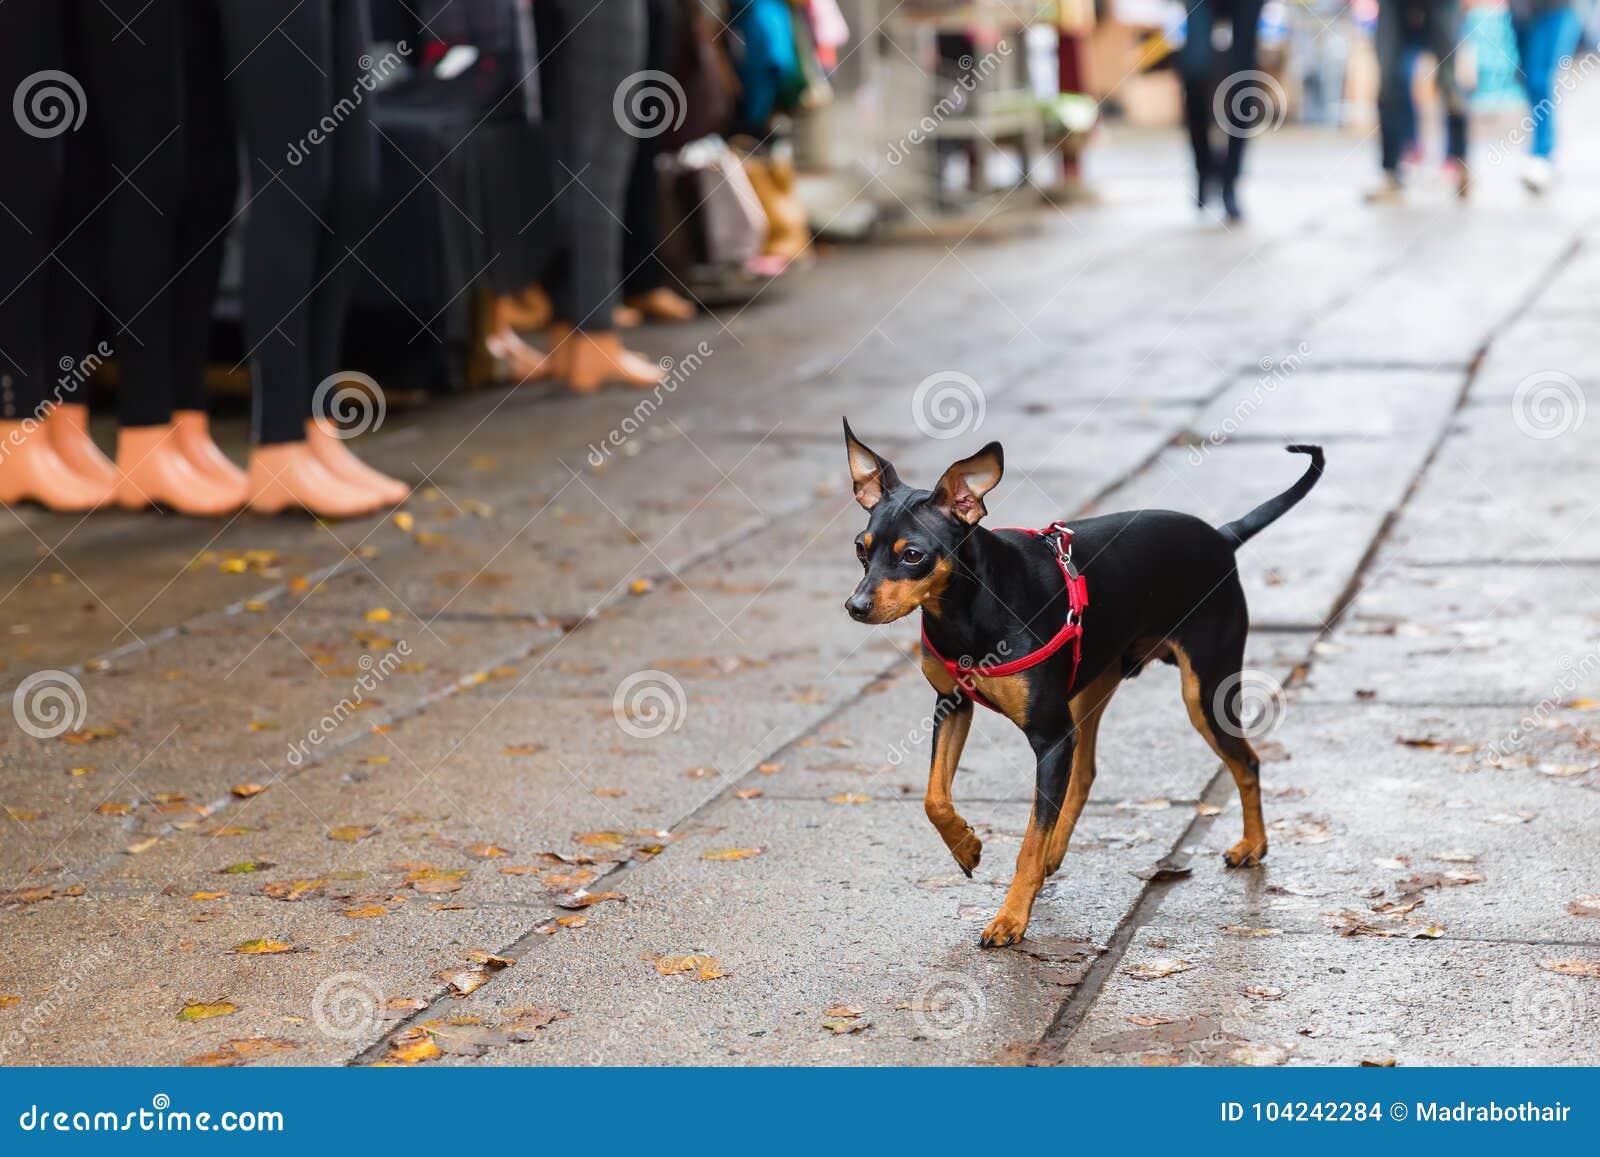 Pinscher dog walking on a shopping road